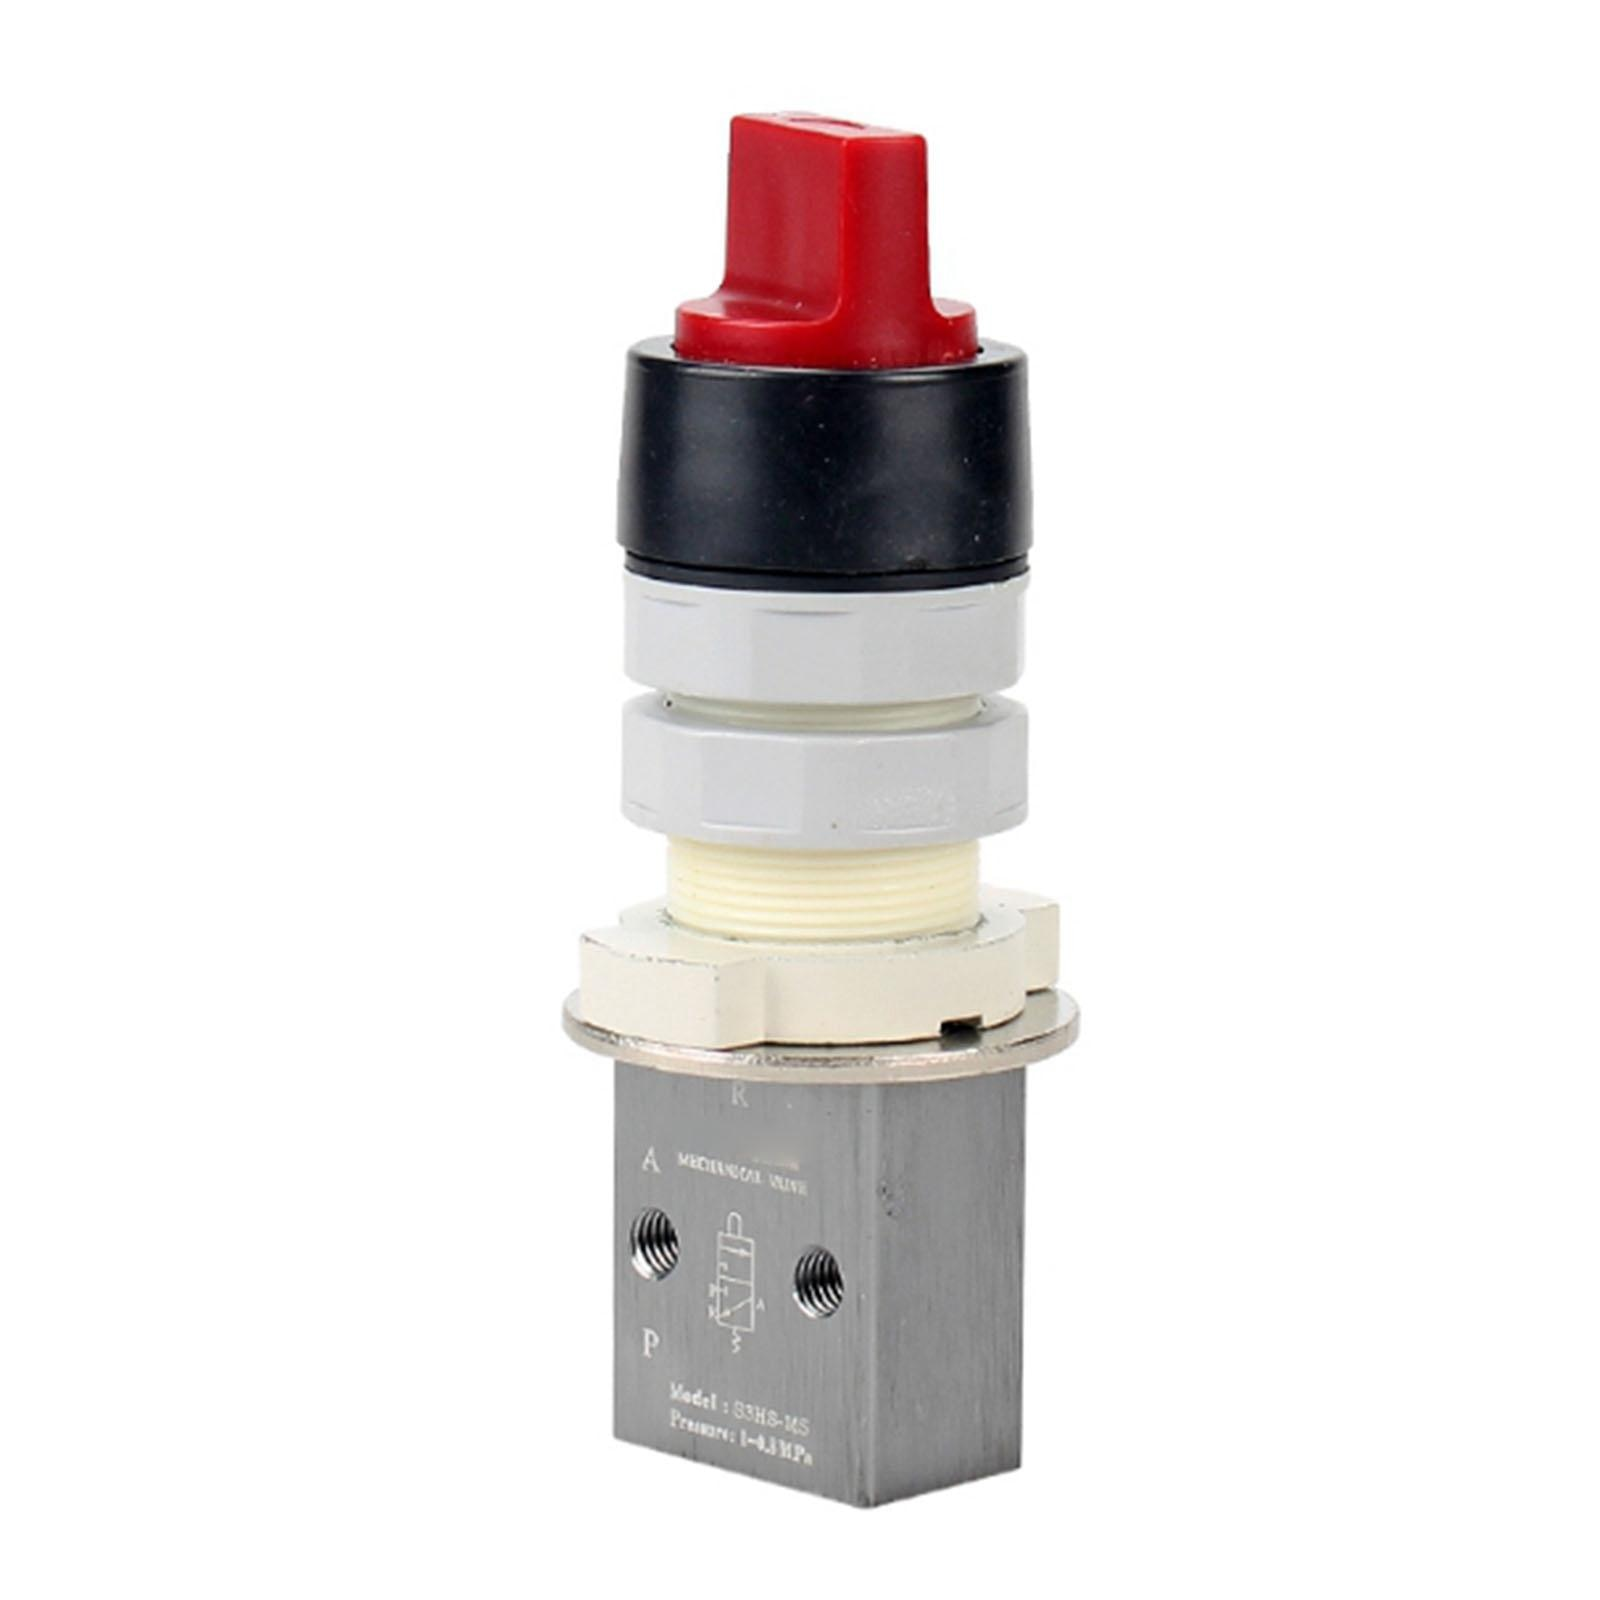 "S3HS-M5/06/08 M5 1/8 ""1/4"" BSP 3/2 Way Selector tipo válvula mecánica neumática"